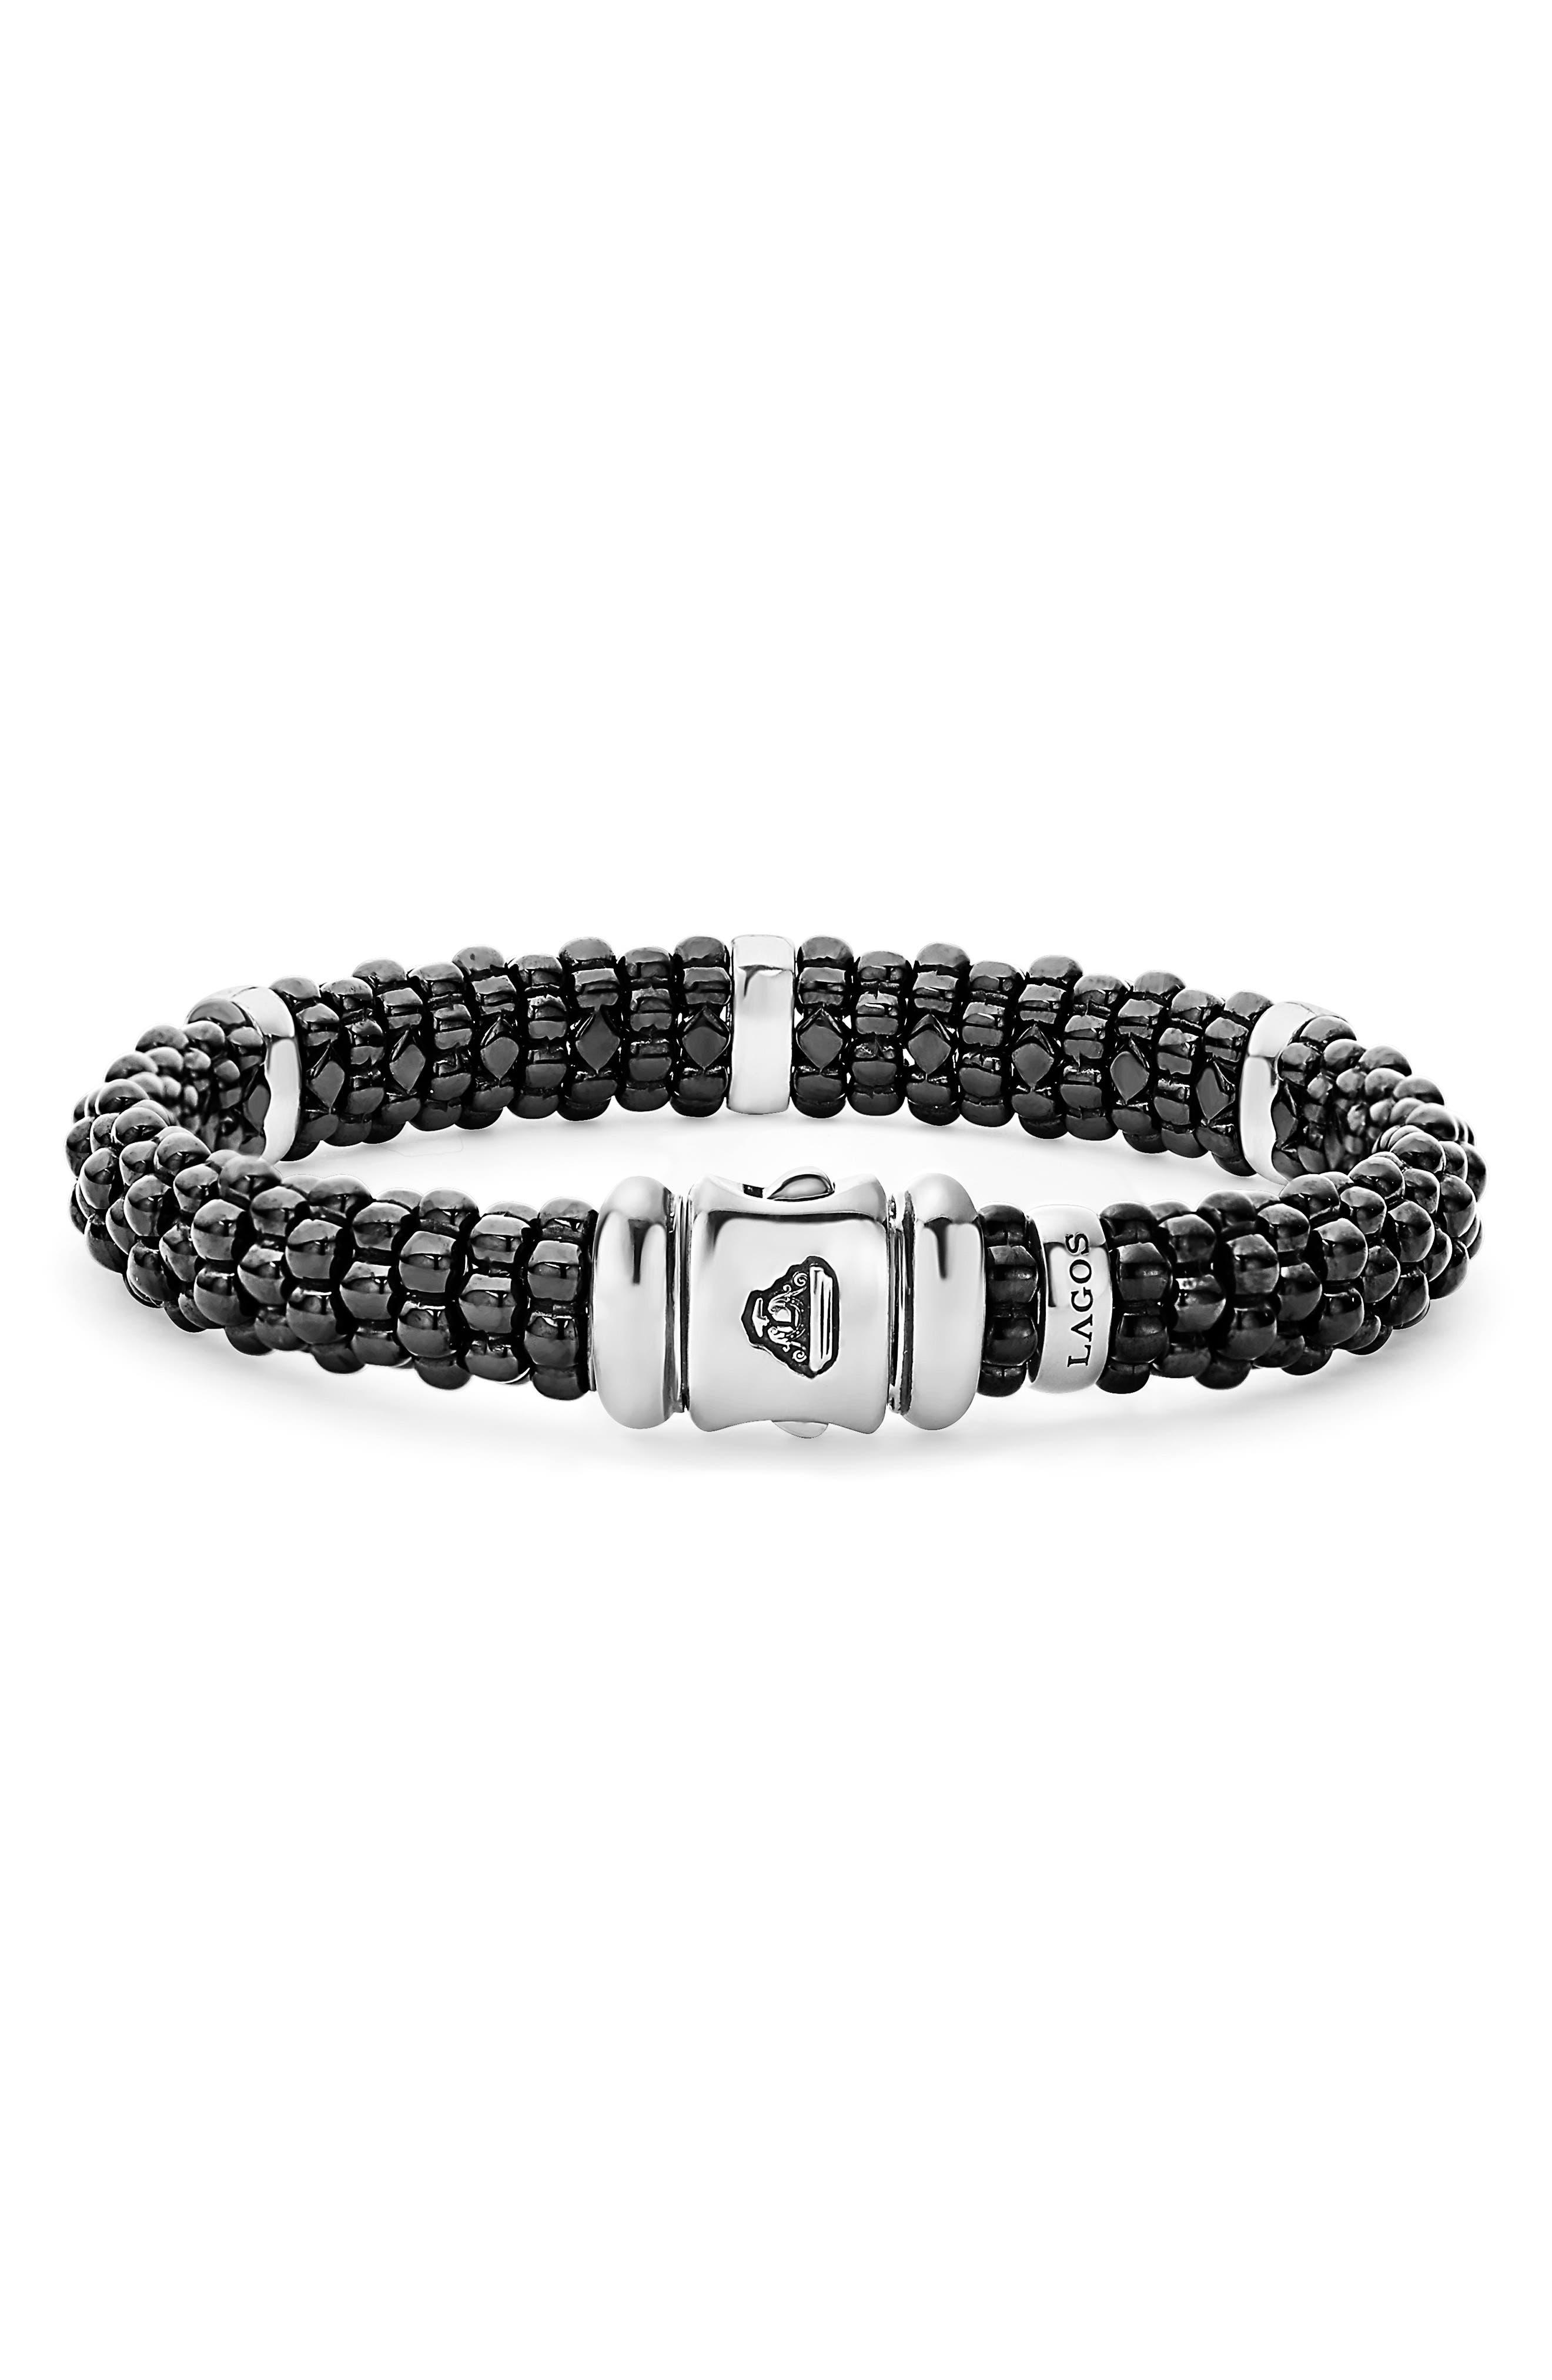 Black Caviar Diamond Bracelet,                             Alternate thumbnail 3, color,                             BLACK/ SILVER